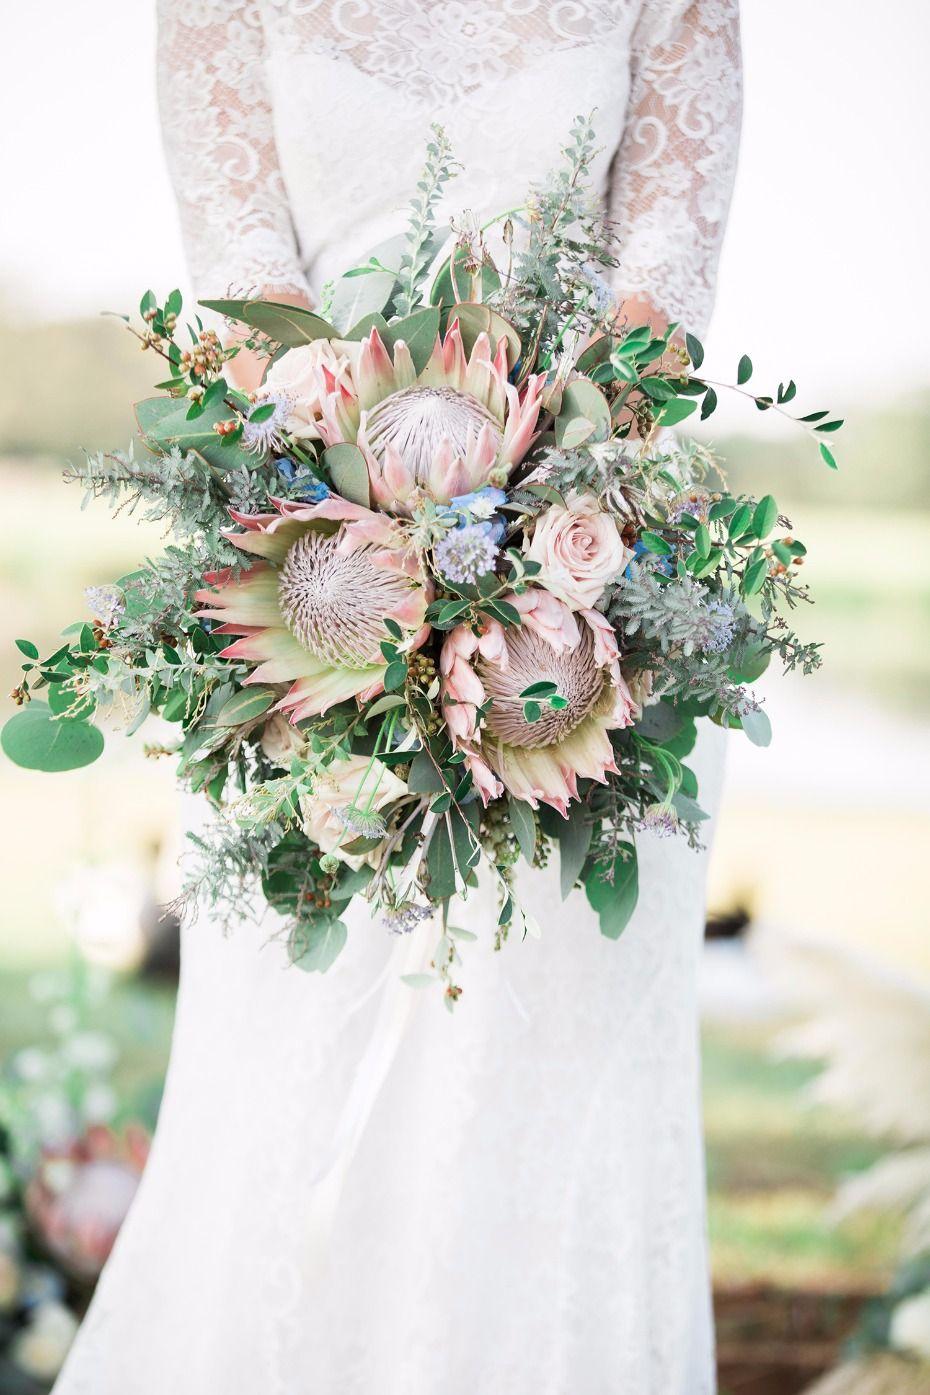 Free Spirited Bohemian Wedding Ideas At The Wildflower Flower